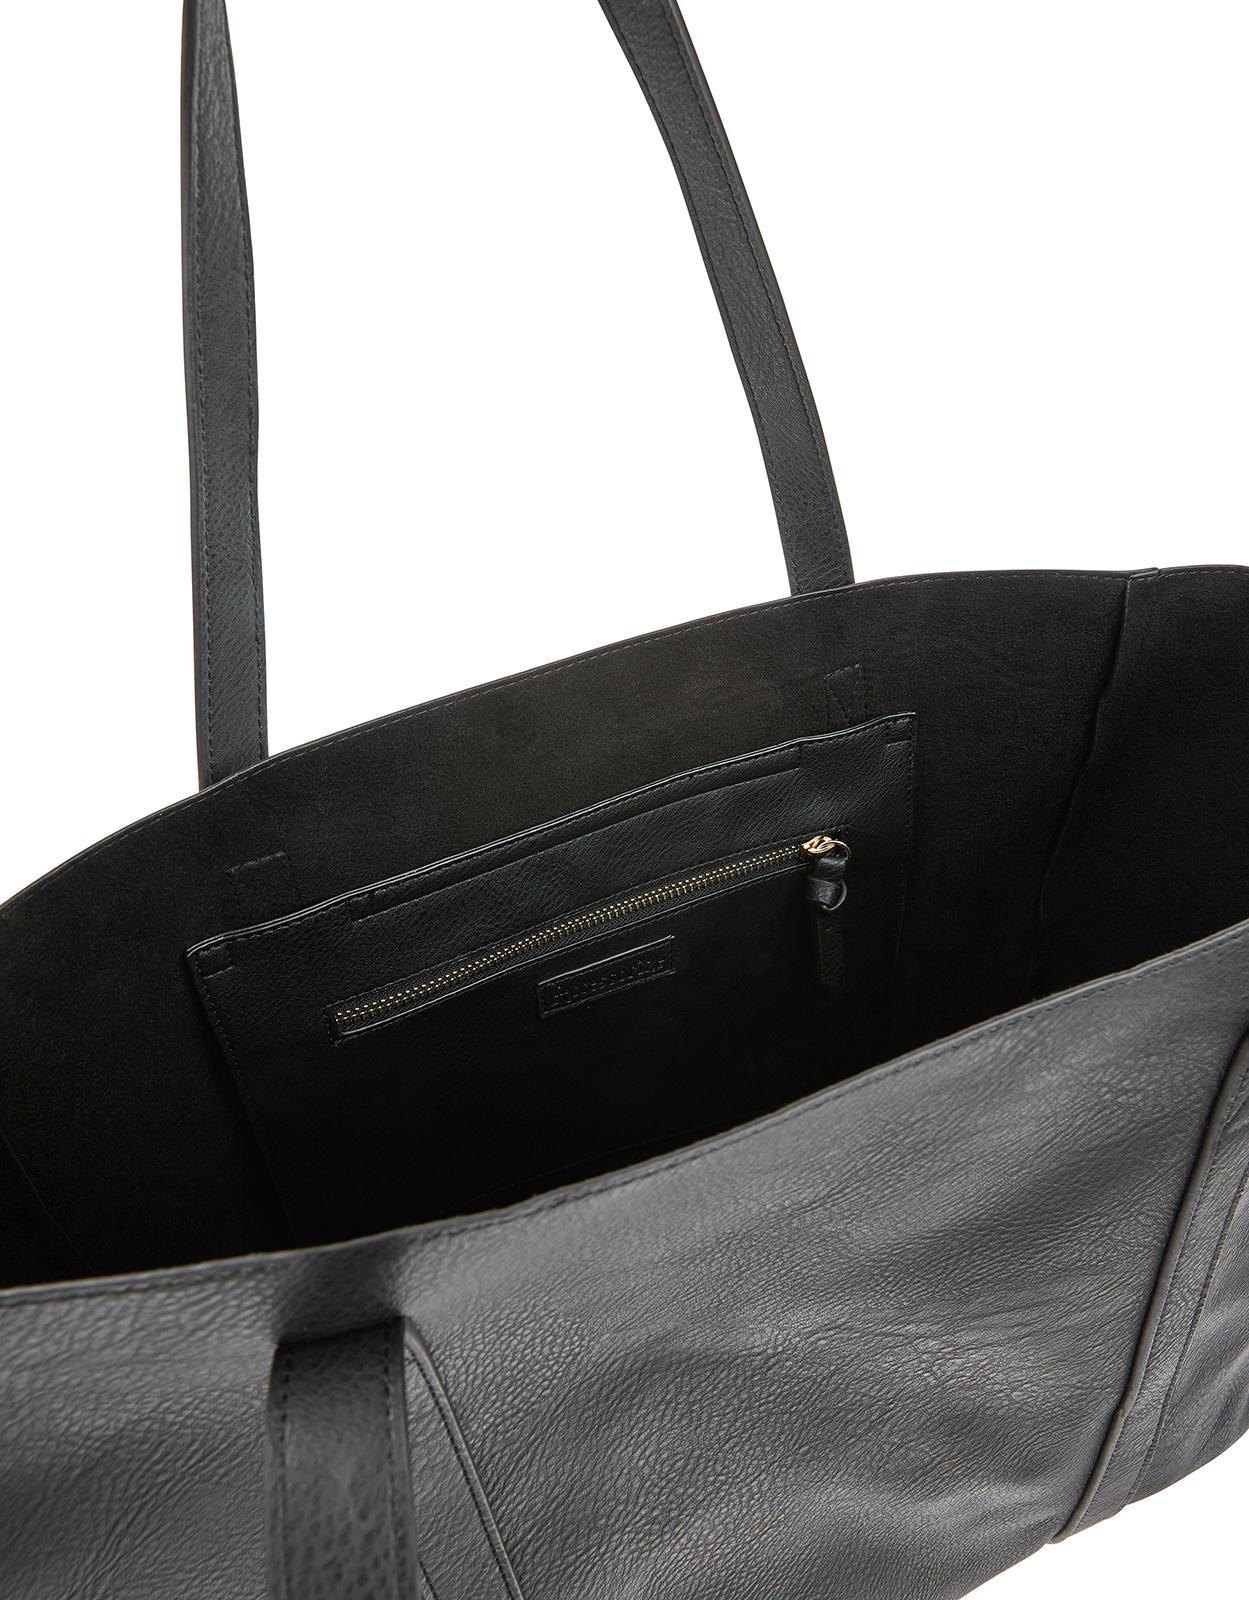 052daa516a Accessorize Oversized Tote Bag in Black - Lyst